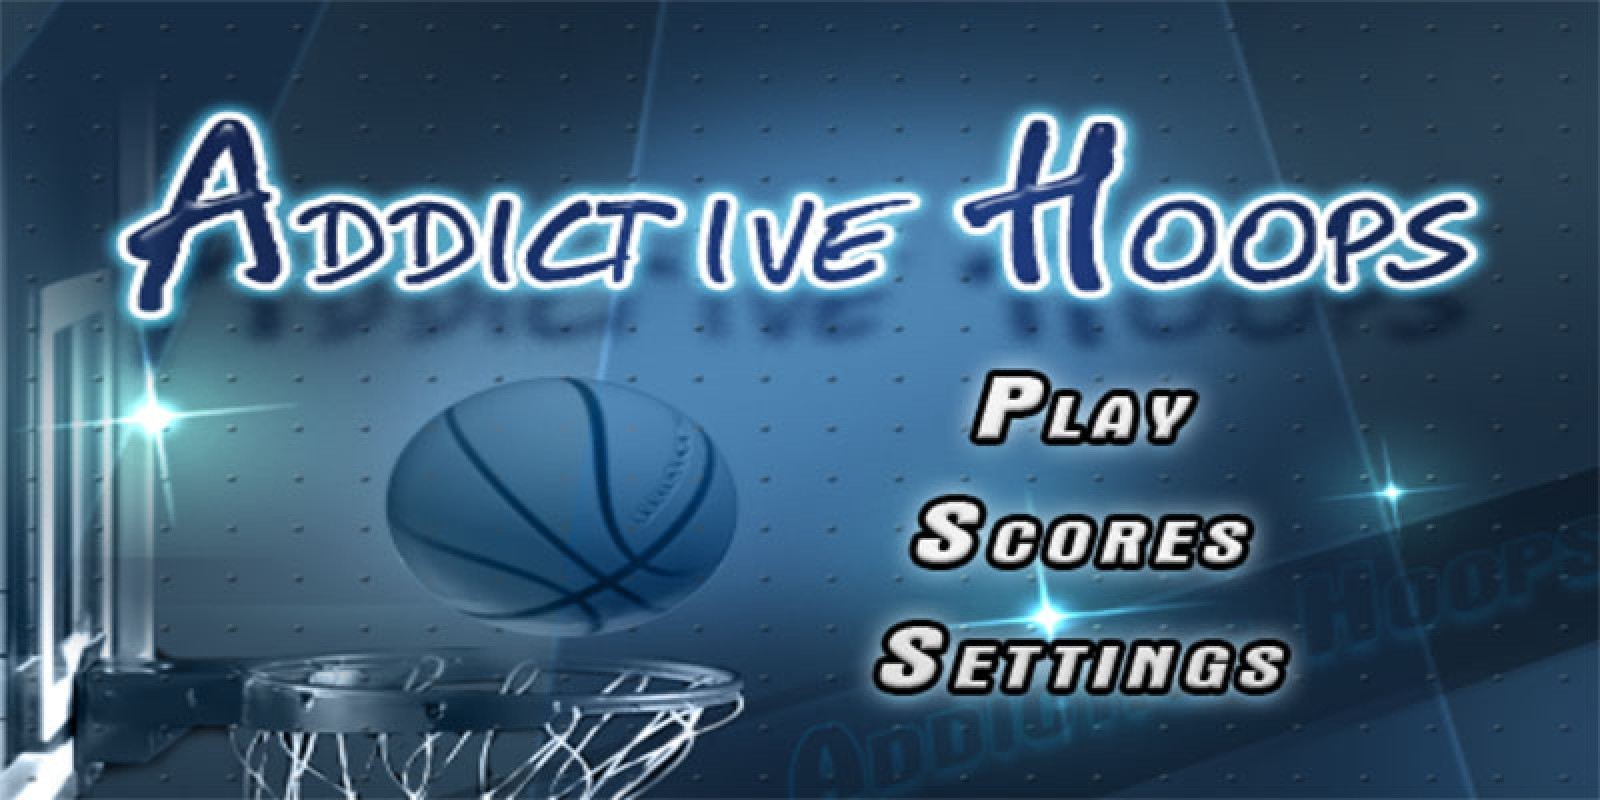 Basketball Hoops - Android Atudio